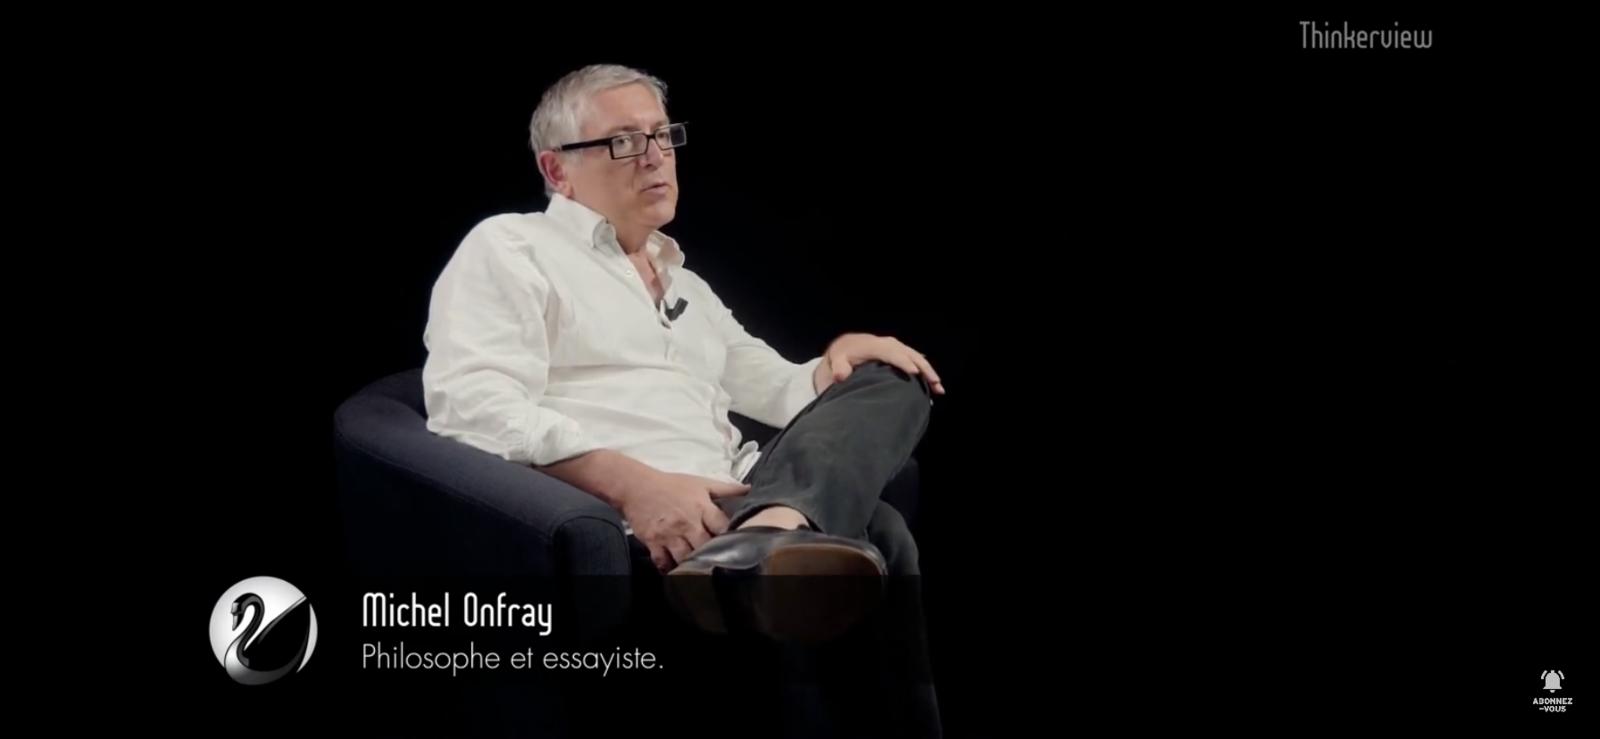 Michel Onfray - où en est la France (Thinkerview) - 19.07.2020